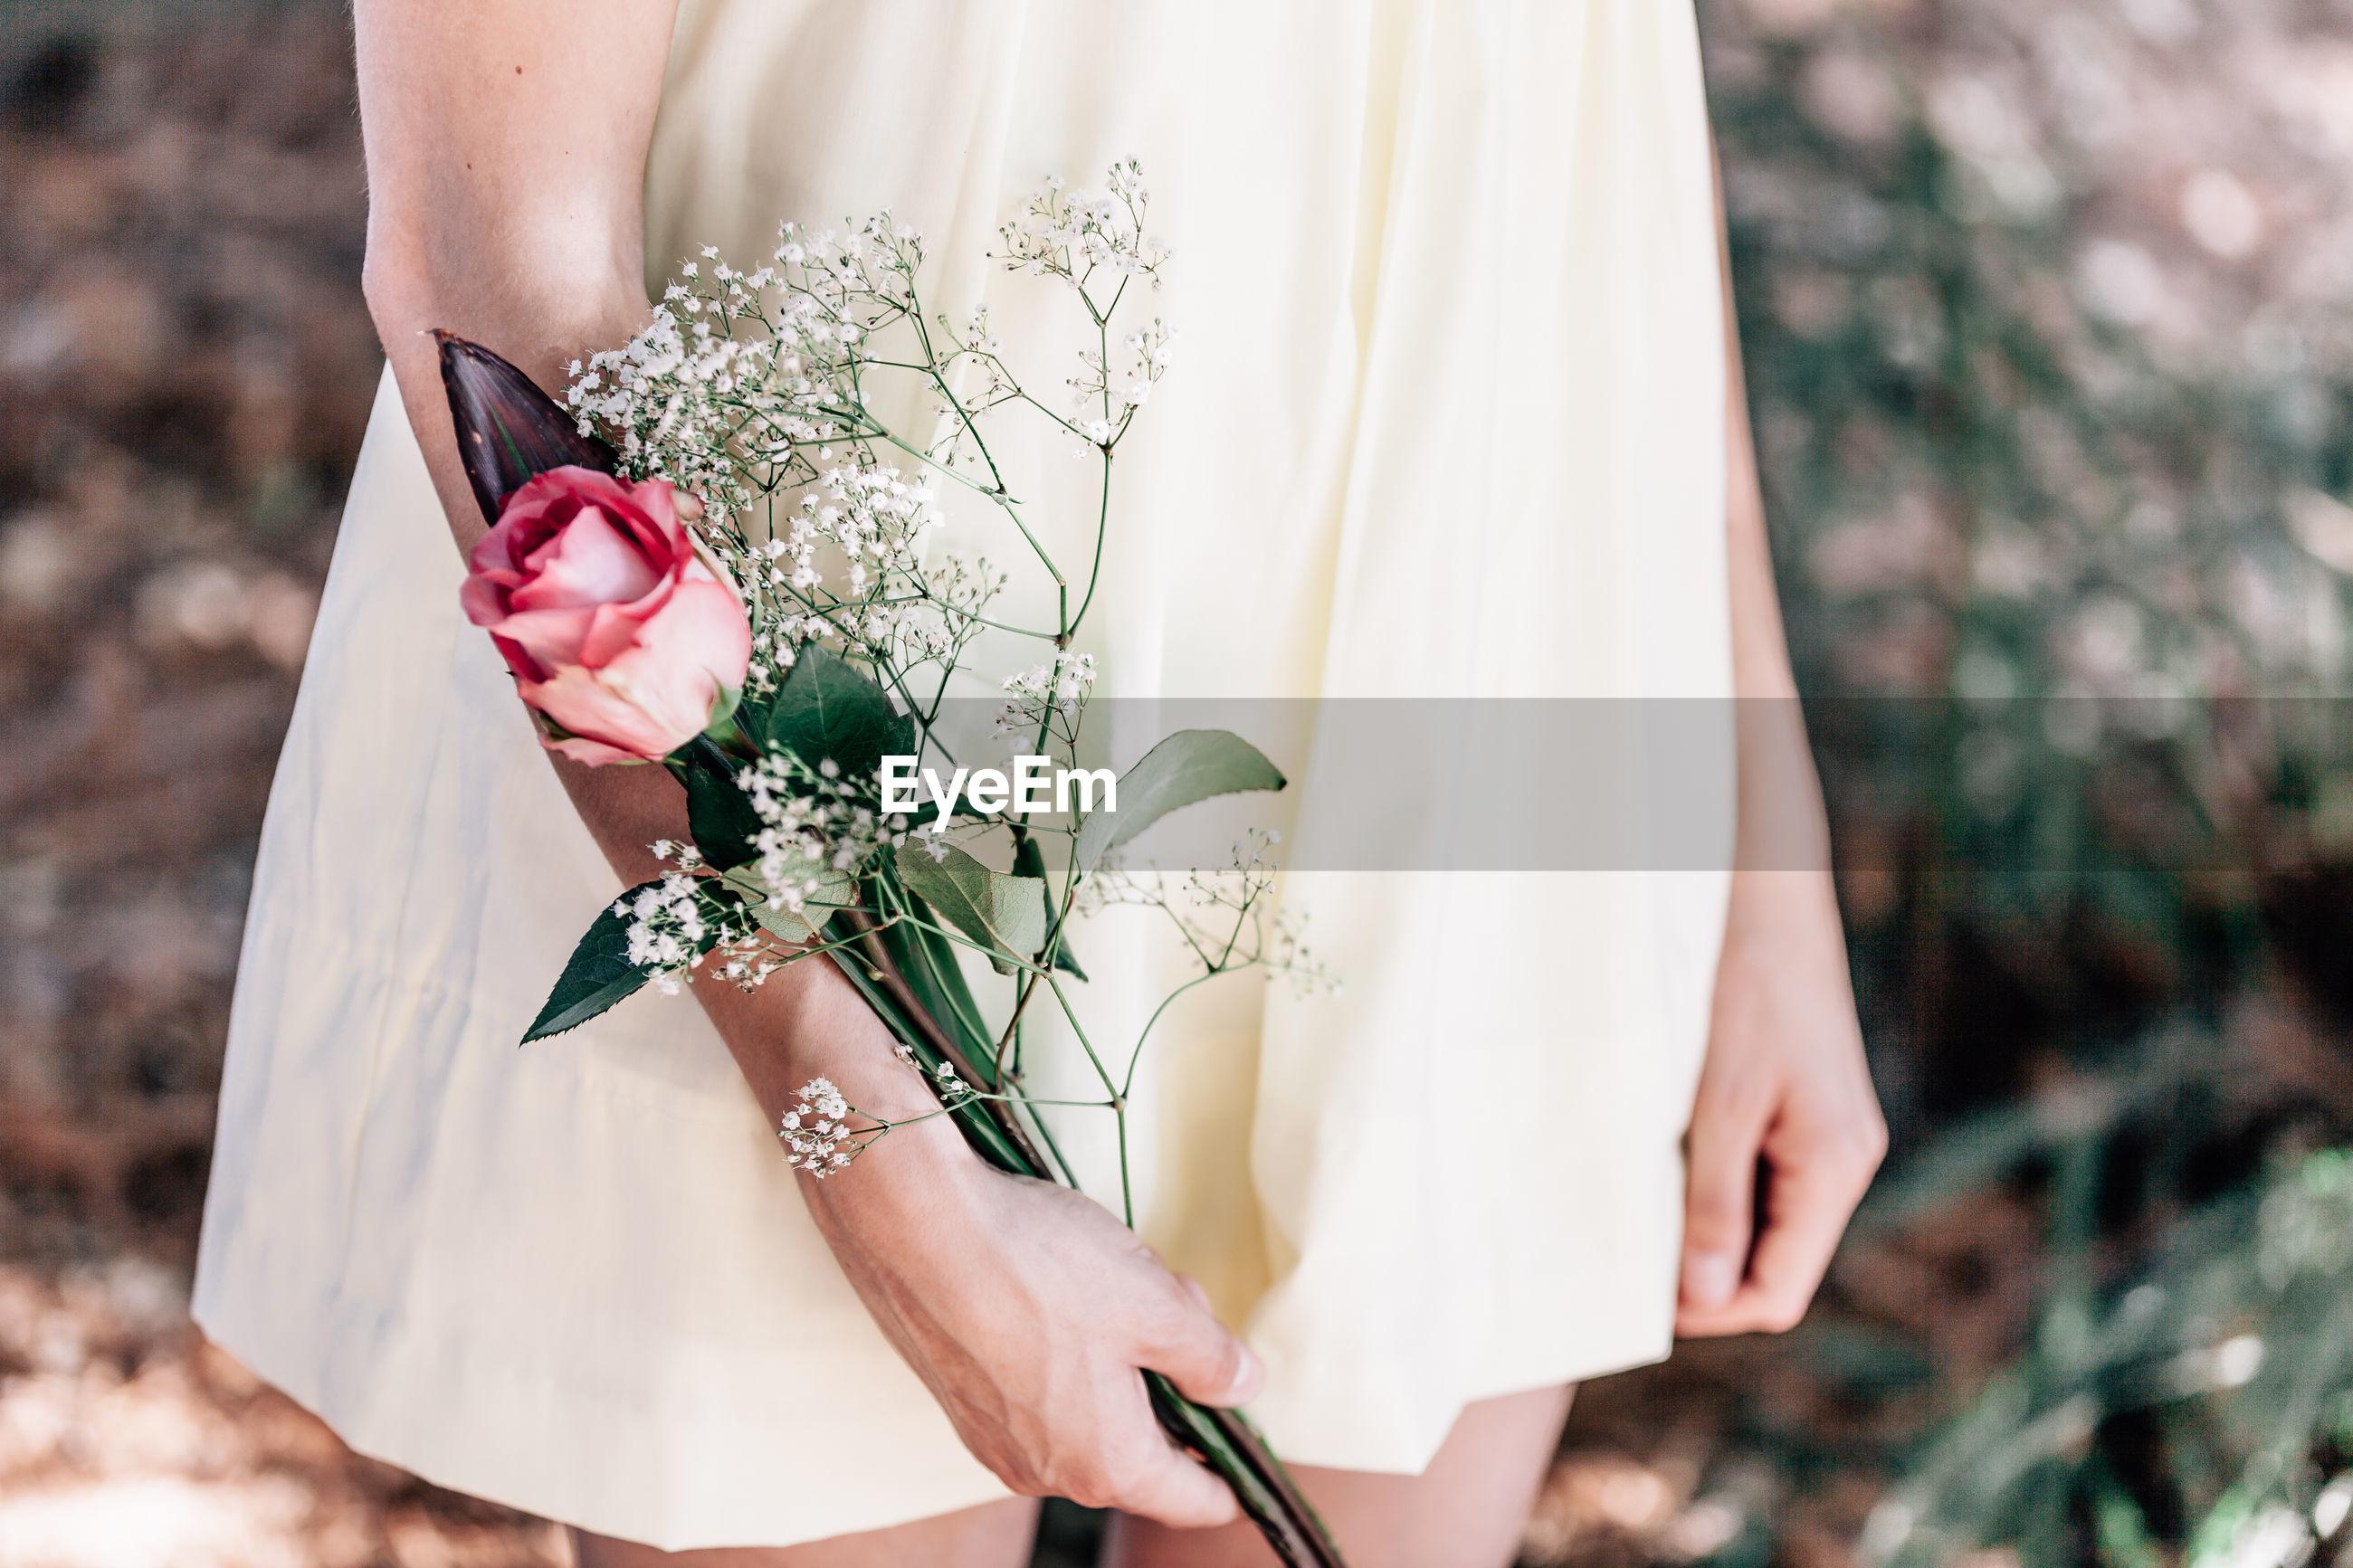 Hand holding rose